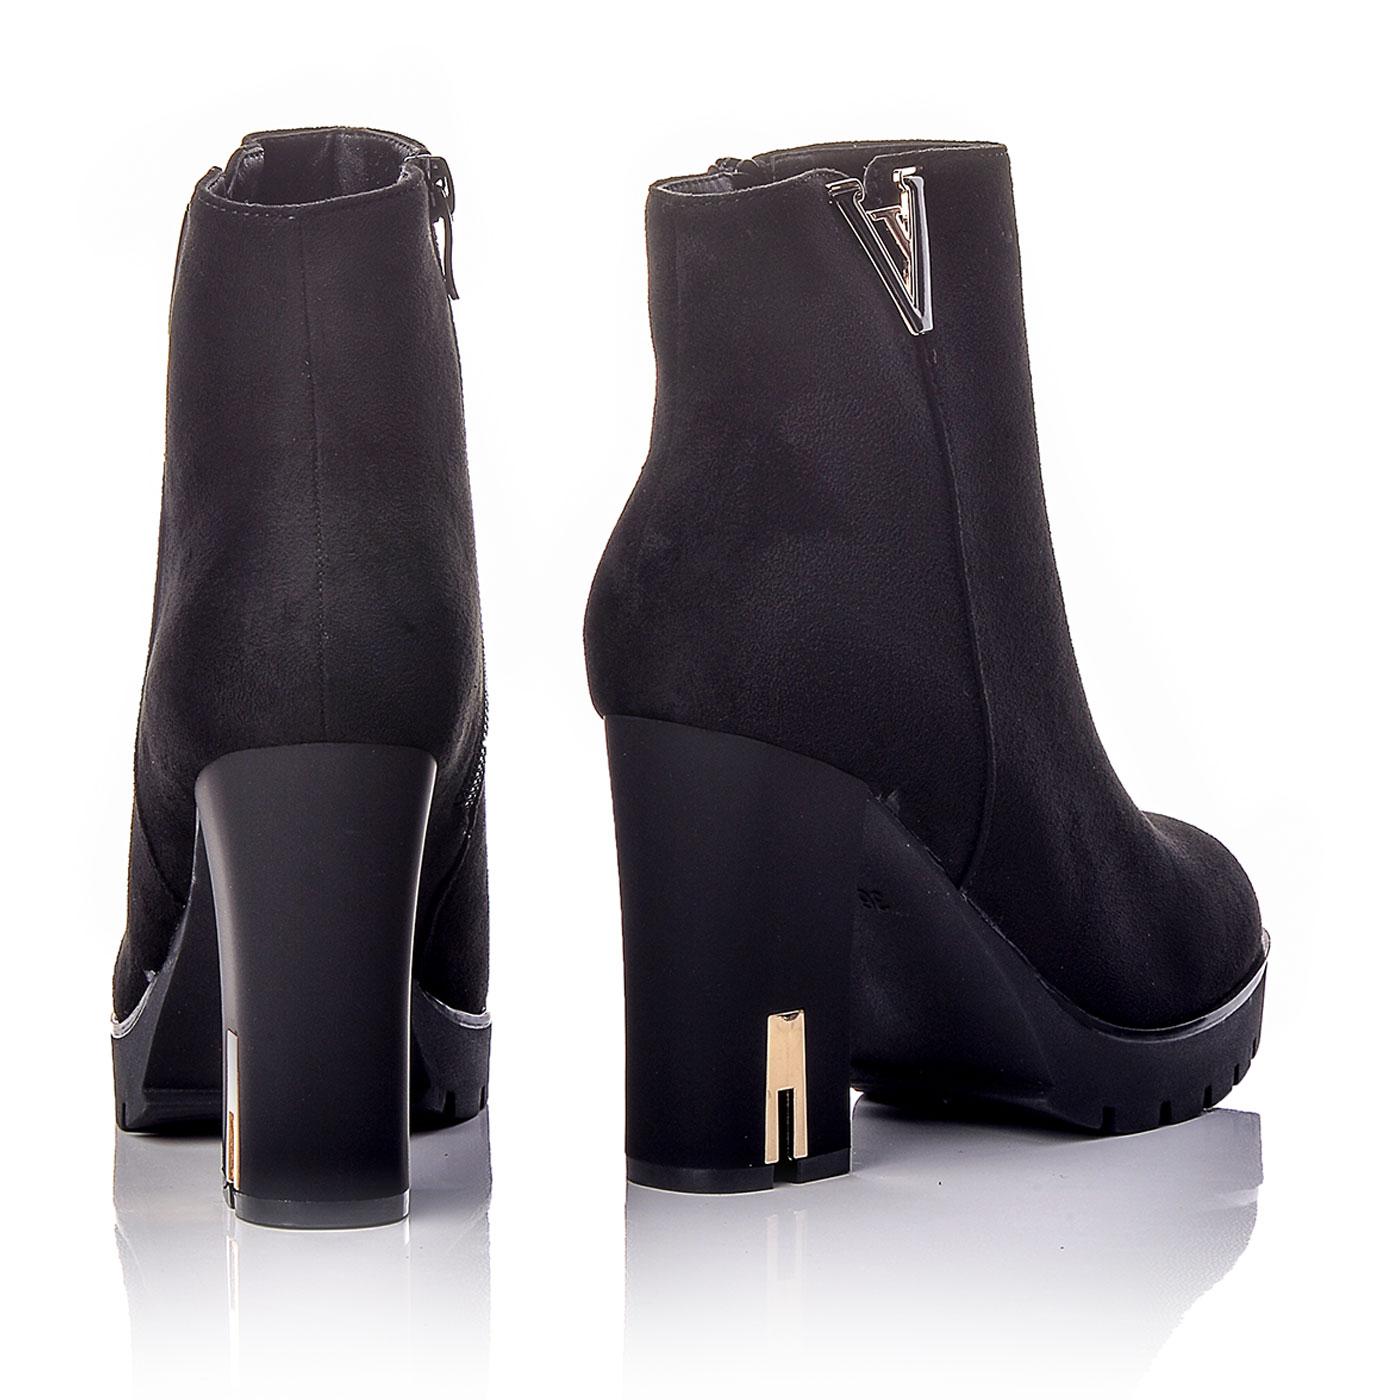 f9bb472aec5 Μποτάκια Καστόρ Μαύρα Με Ψηλό Τακούνι | BlackOut Shoes